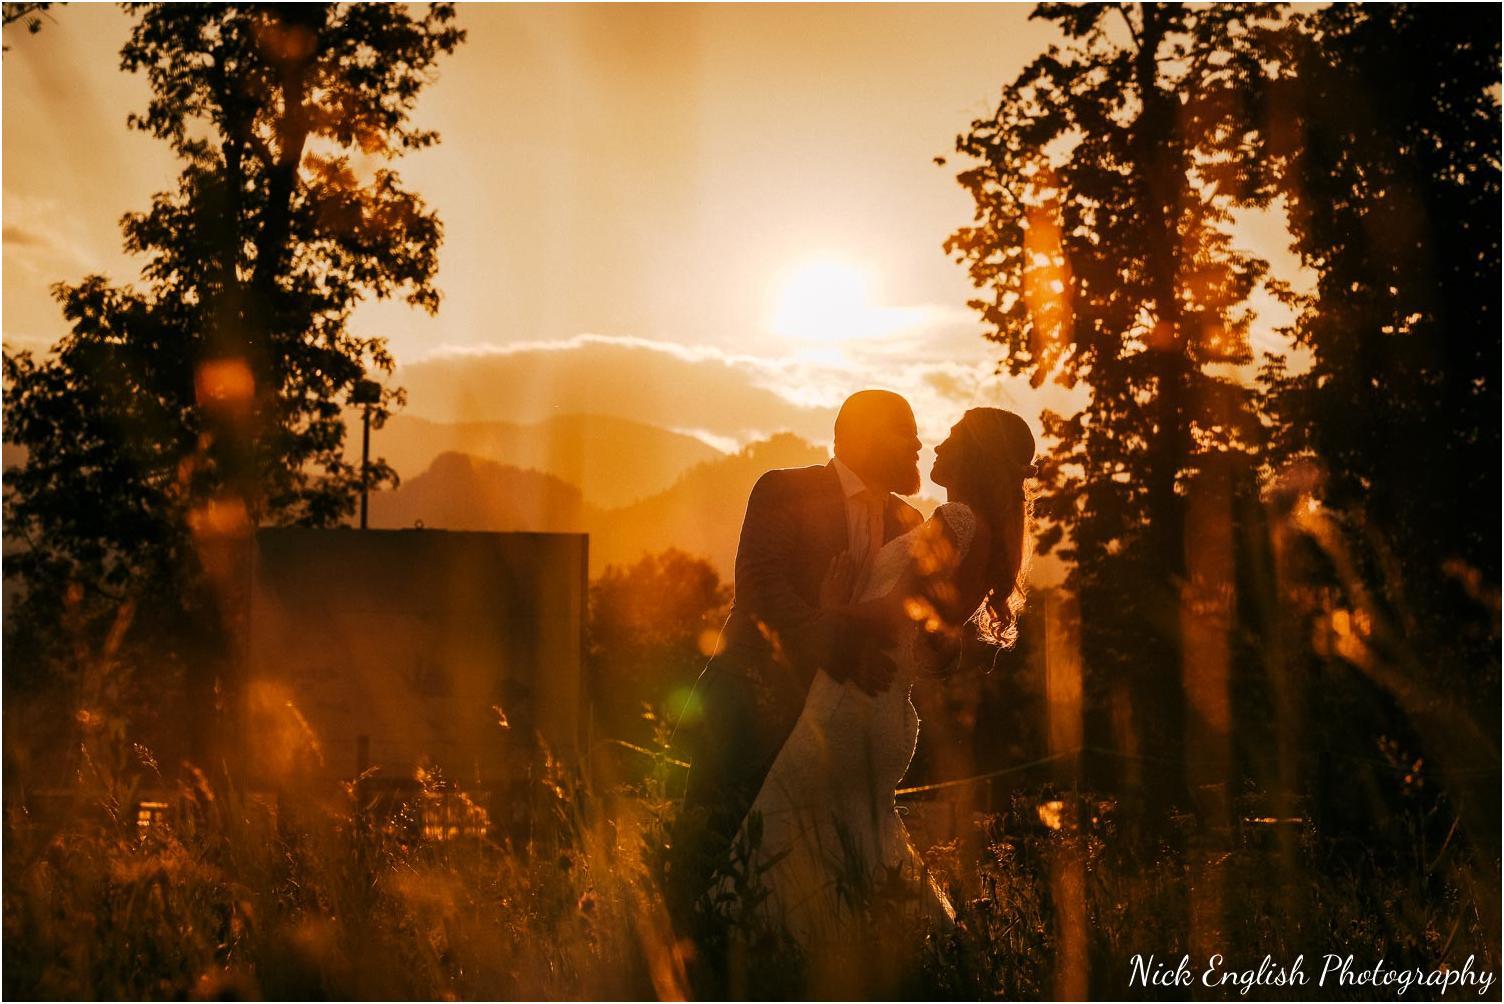 Destination_Wedding_Photographer_Slovenia_Nick_English_Photography-70-36.jpg